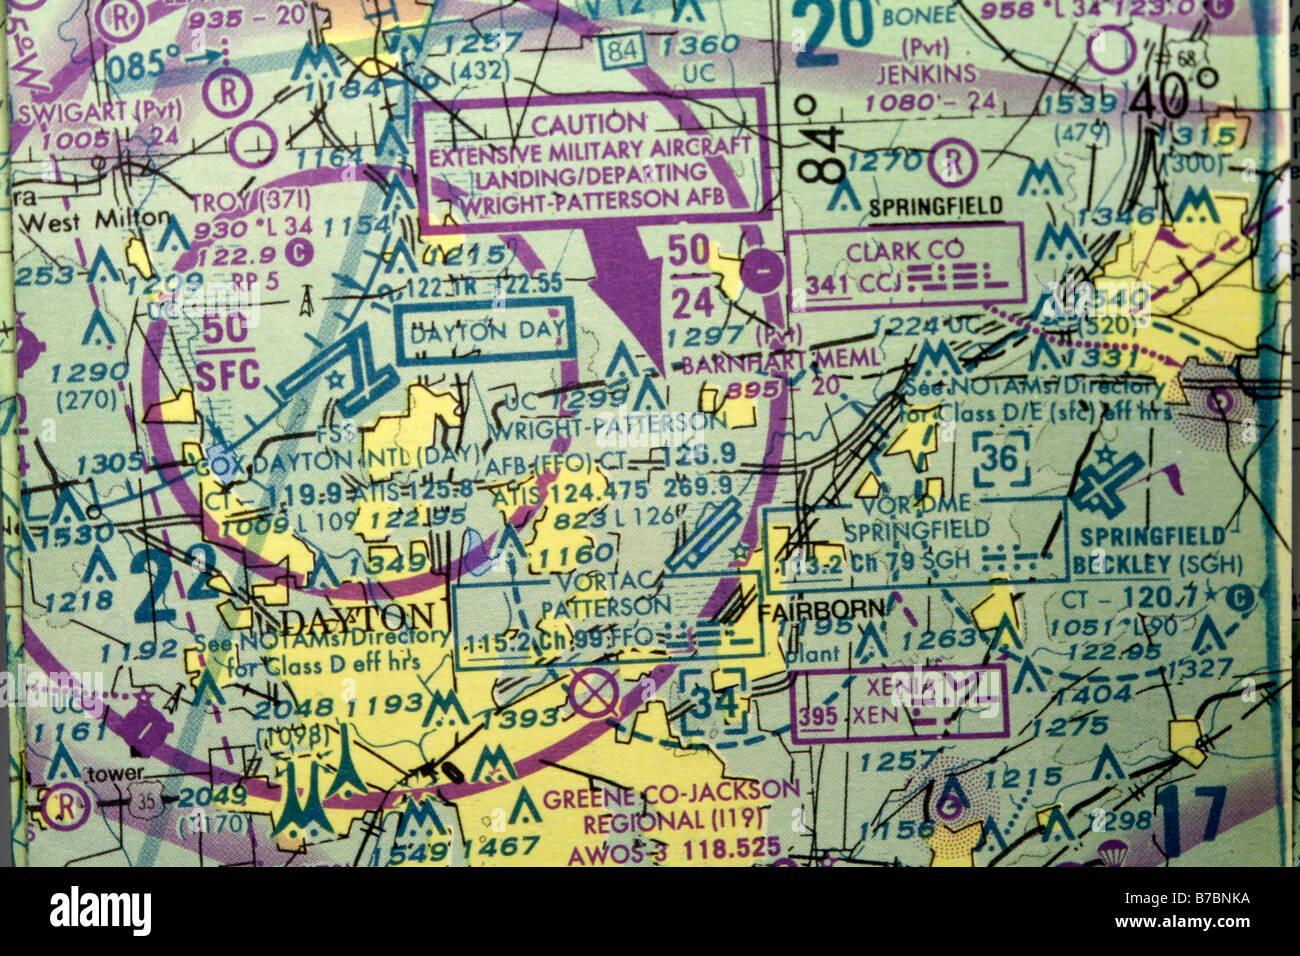 Portion of US sectional aeronautical chart showing Dayton Ohio and